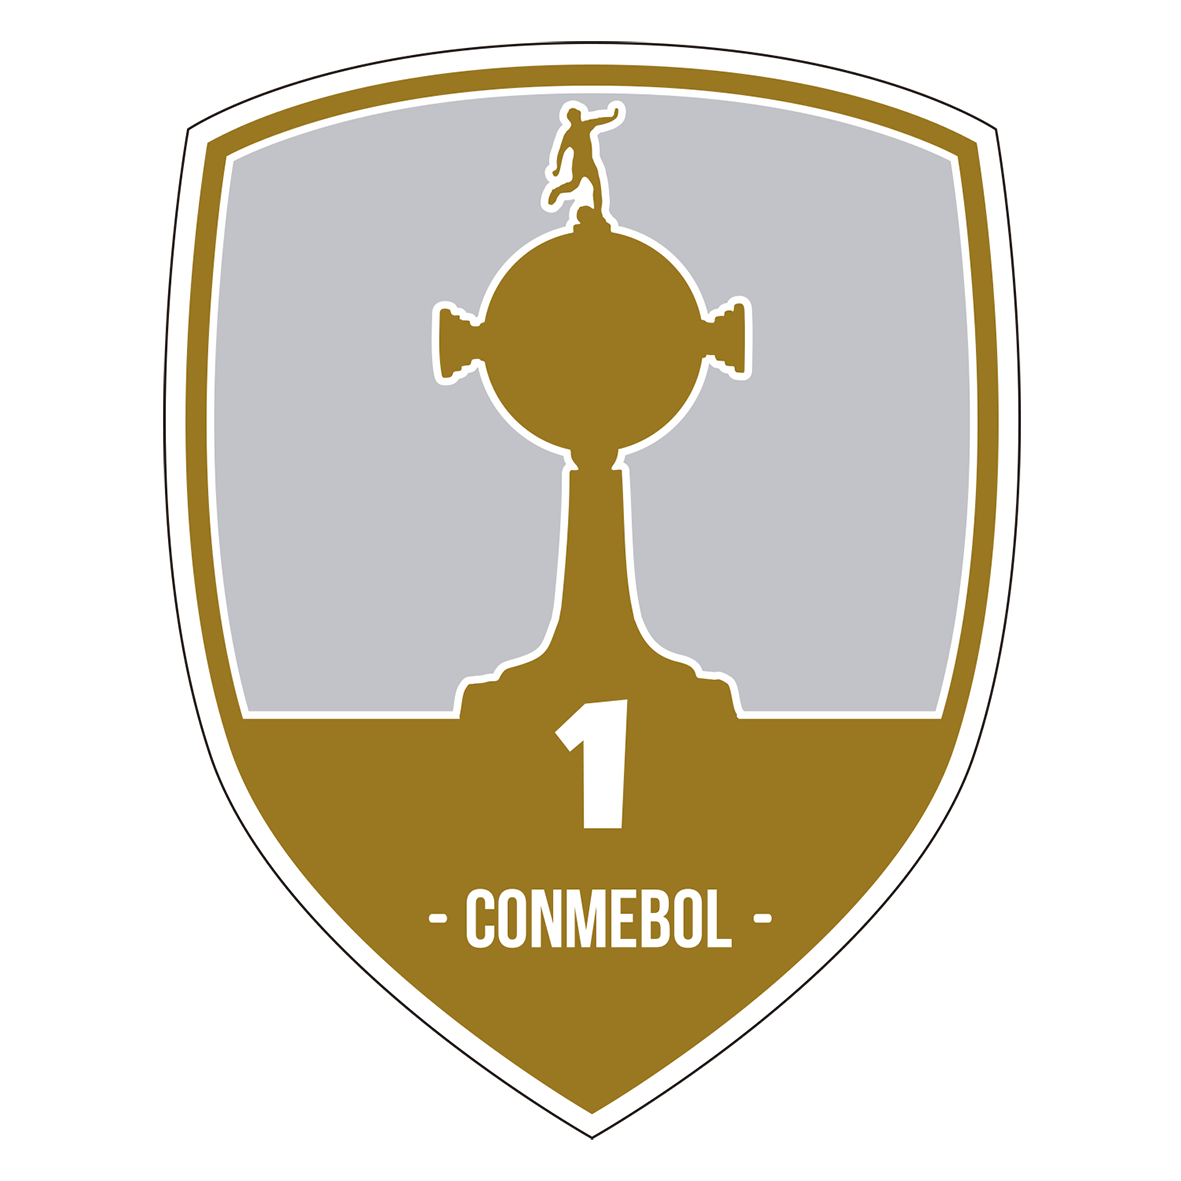 CONMEBOL Copa Libertadores Winners' Jersey Patch Clubes